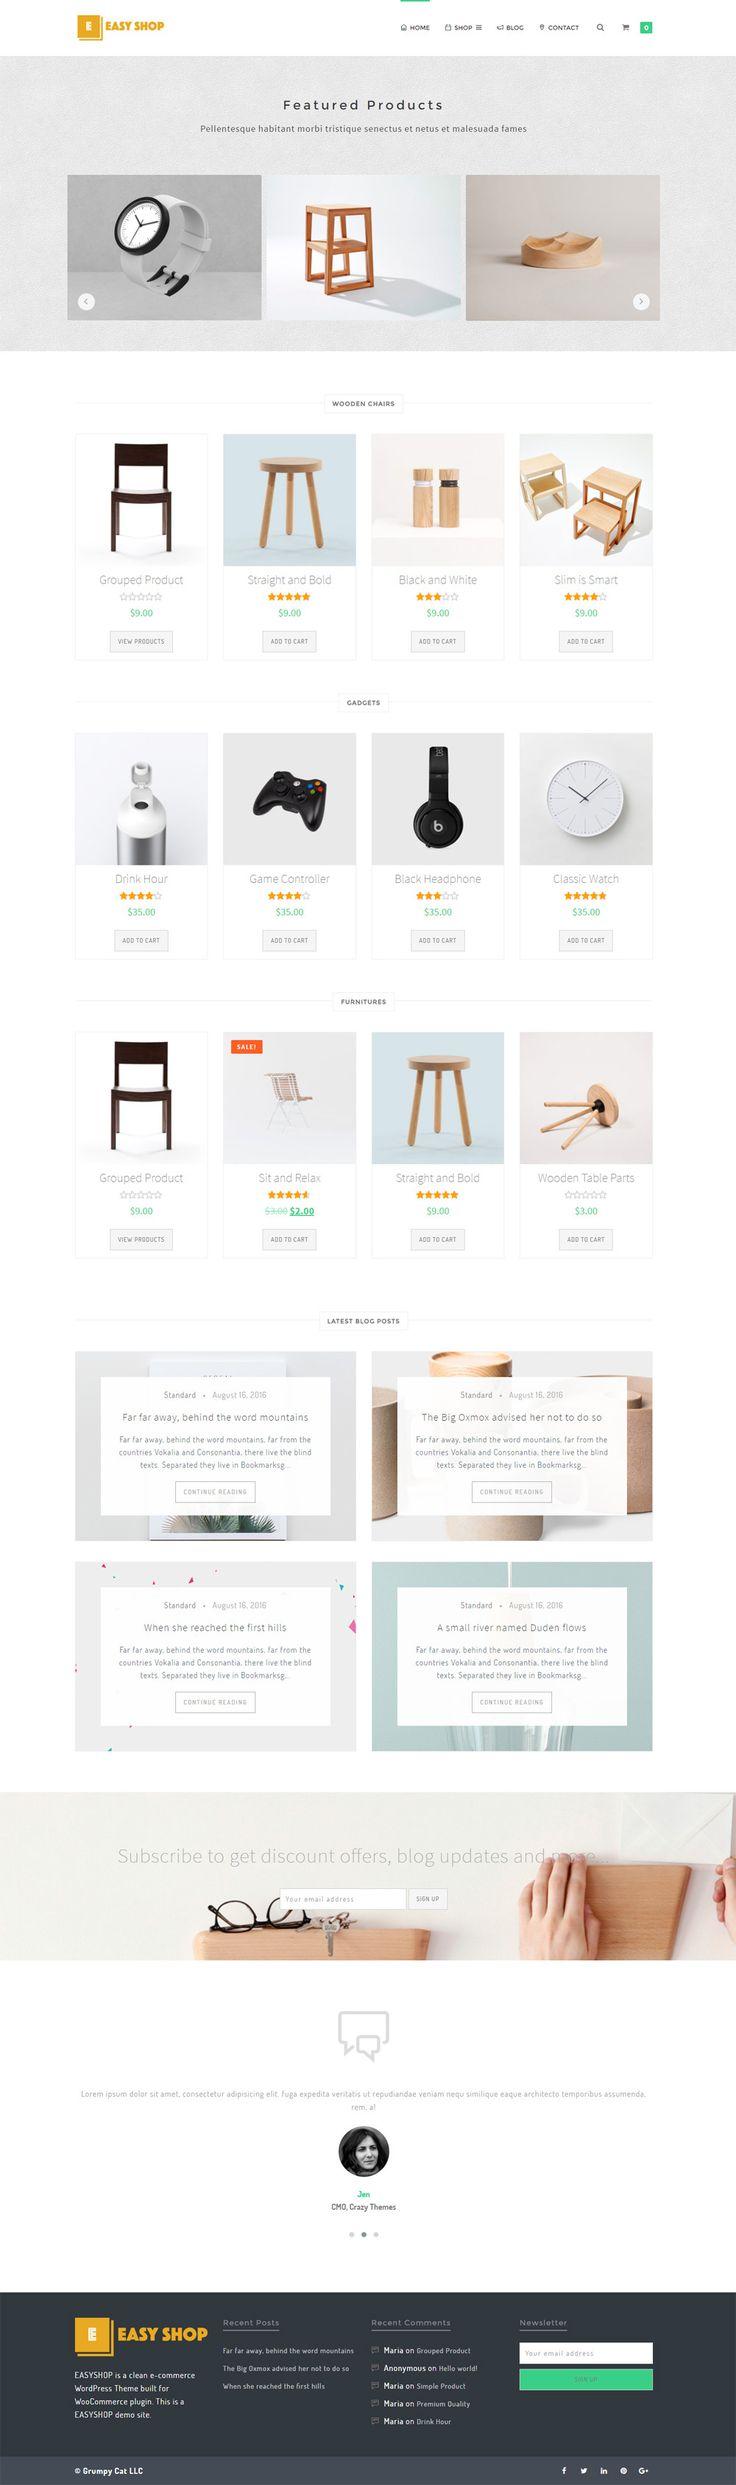 easy-shop-woocommerce-wordpress-theme